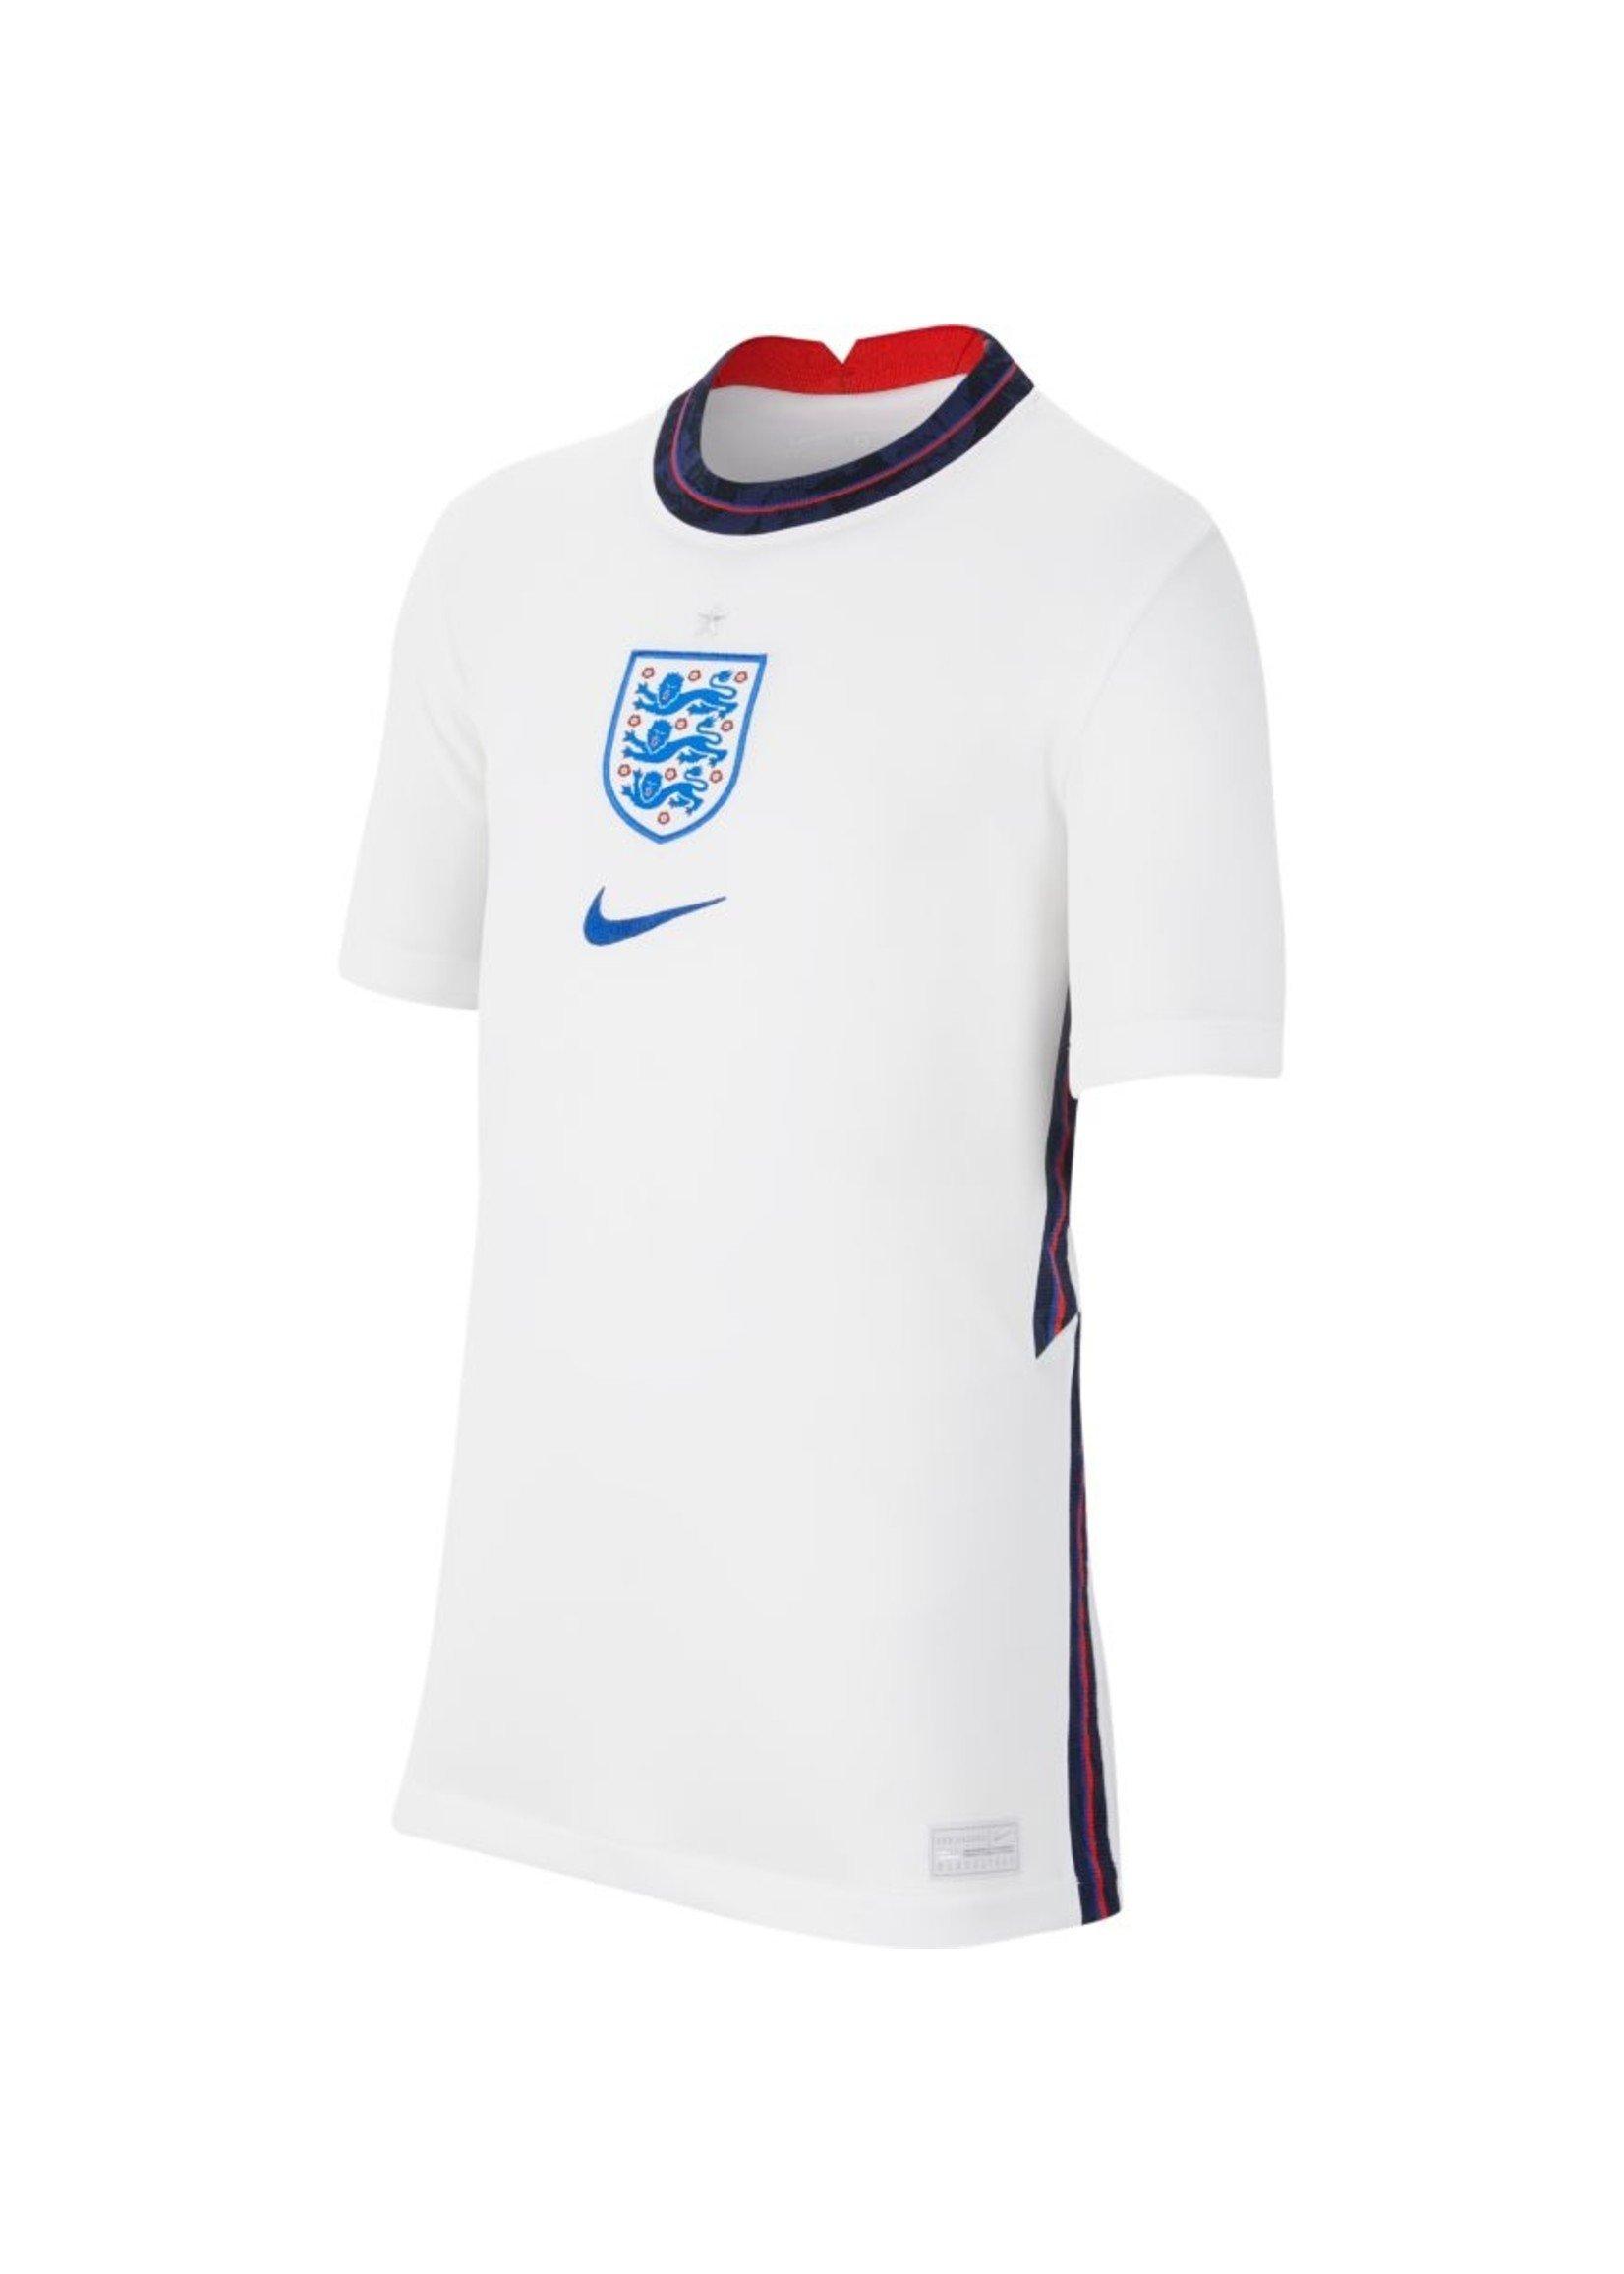 Nike England 20/21 Home Jersey Youth